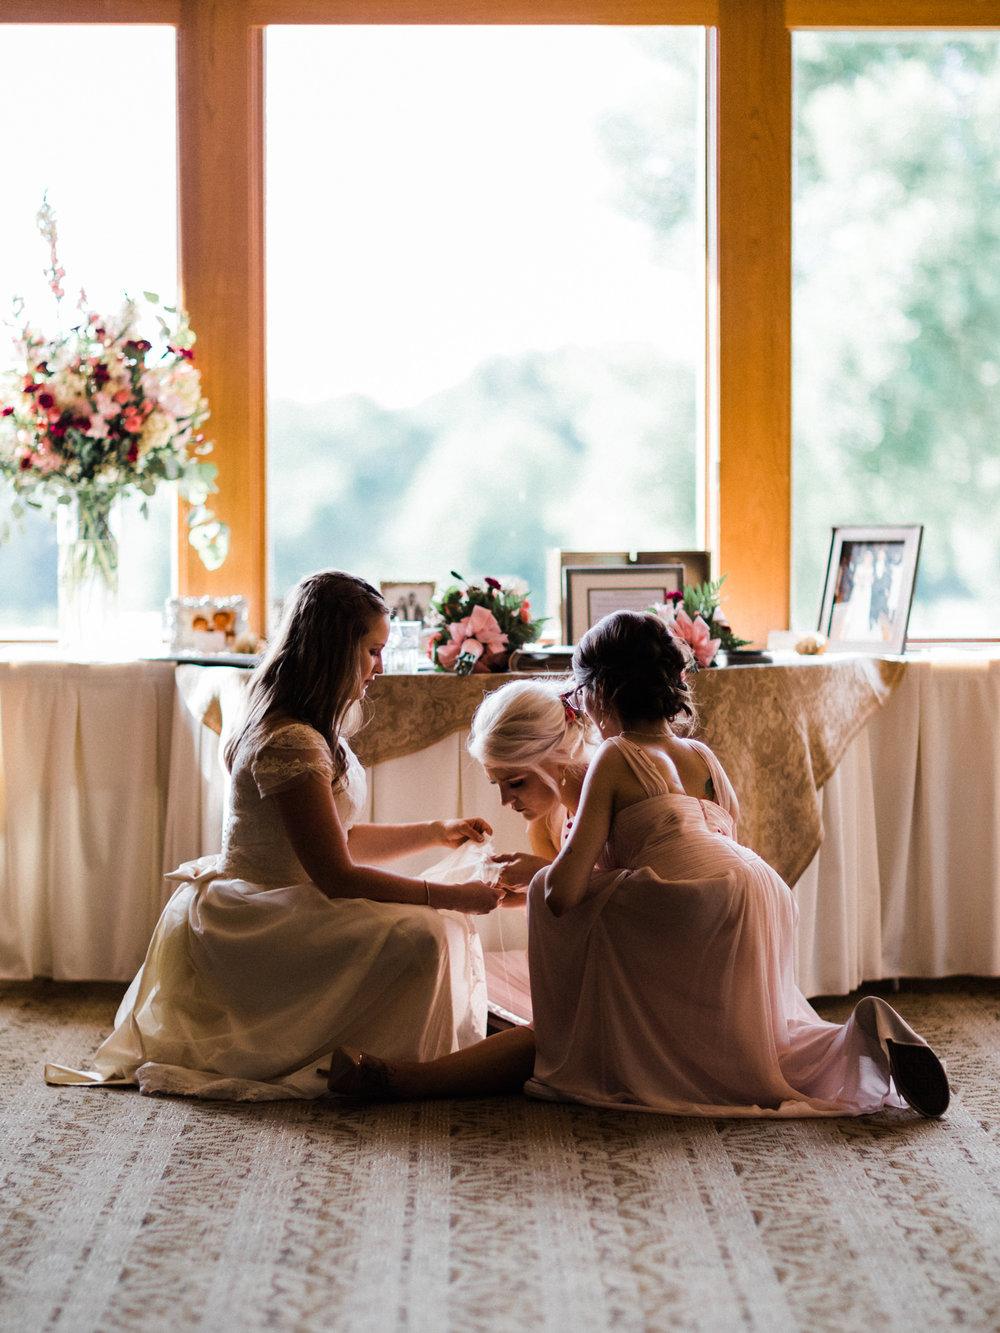 0060-TTFS-DALLAS-WEDDING-PHOTOGRAPHER-20180623.jpg